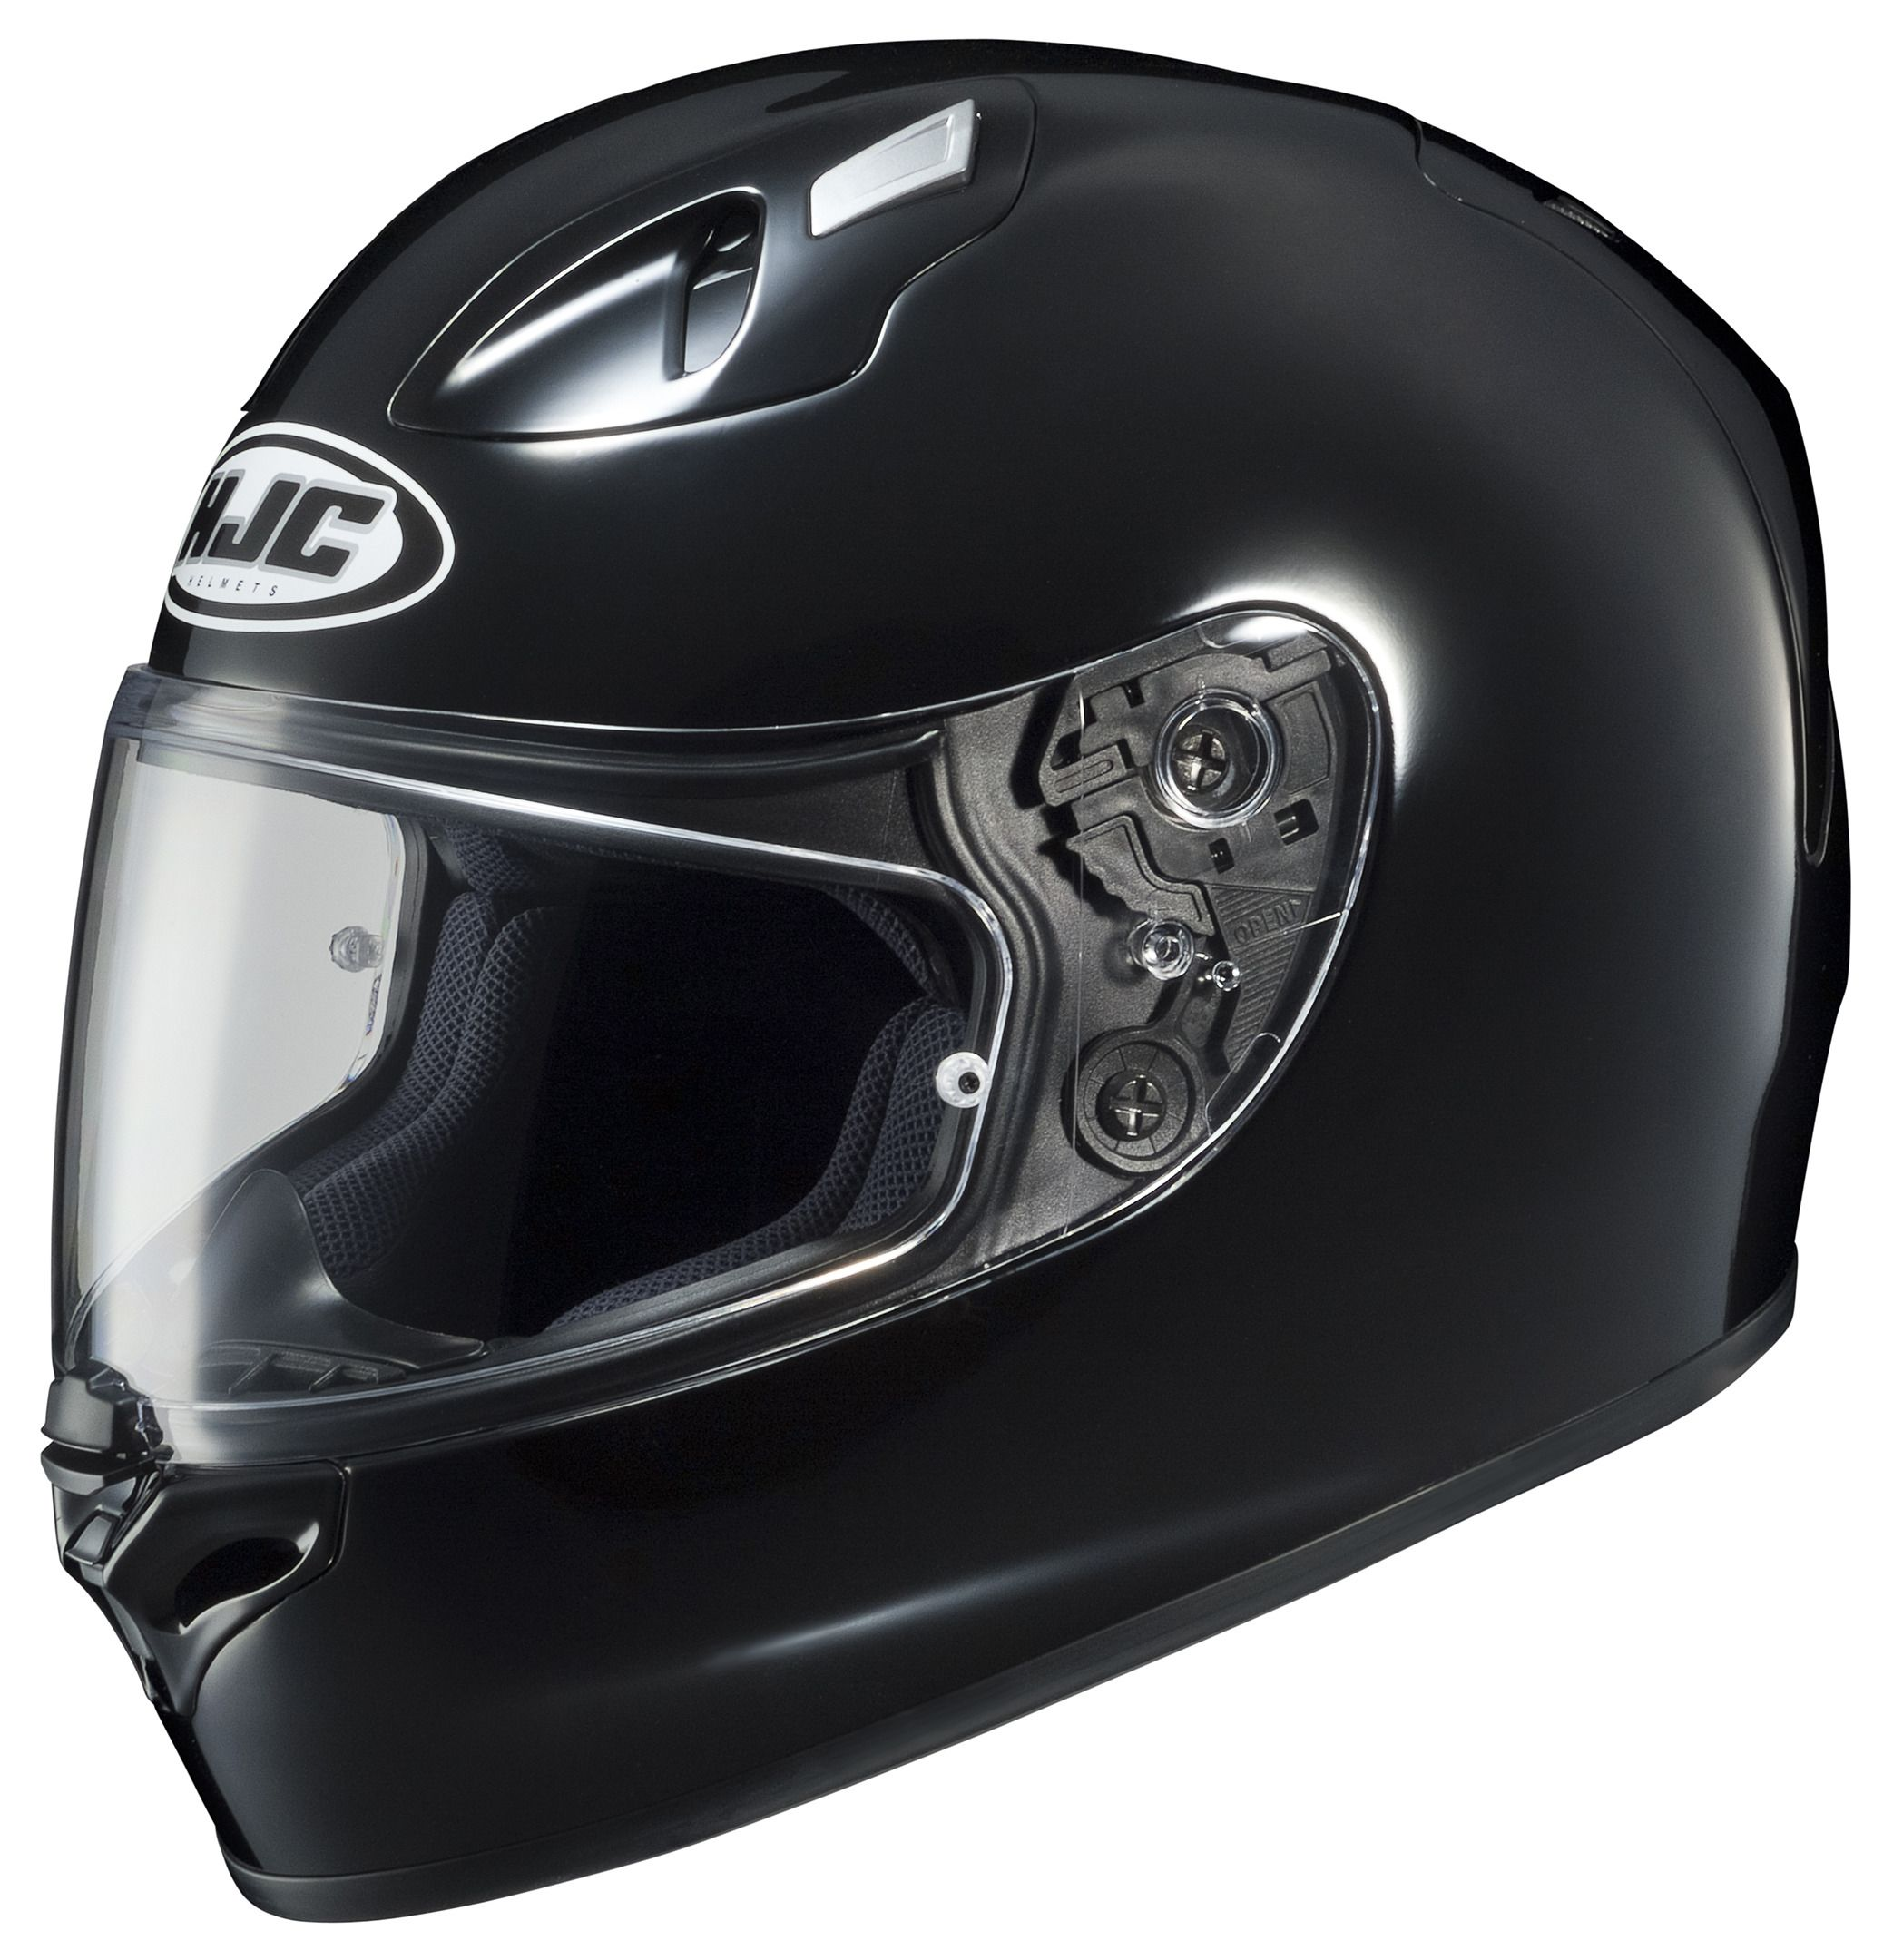 hjc fg 17 helmet solid revzilla. Black Bedroom Furniture Sets. Home Design Ideas